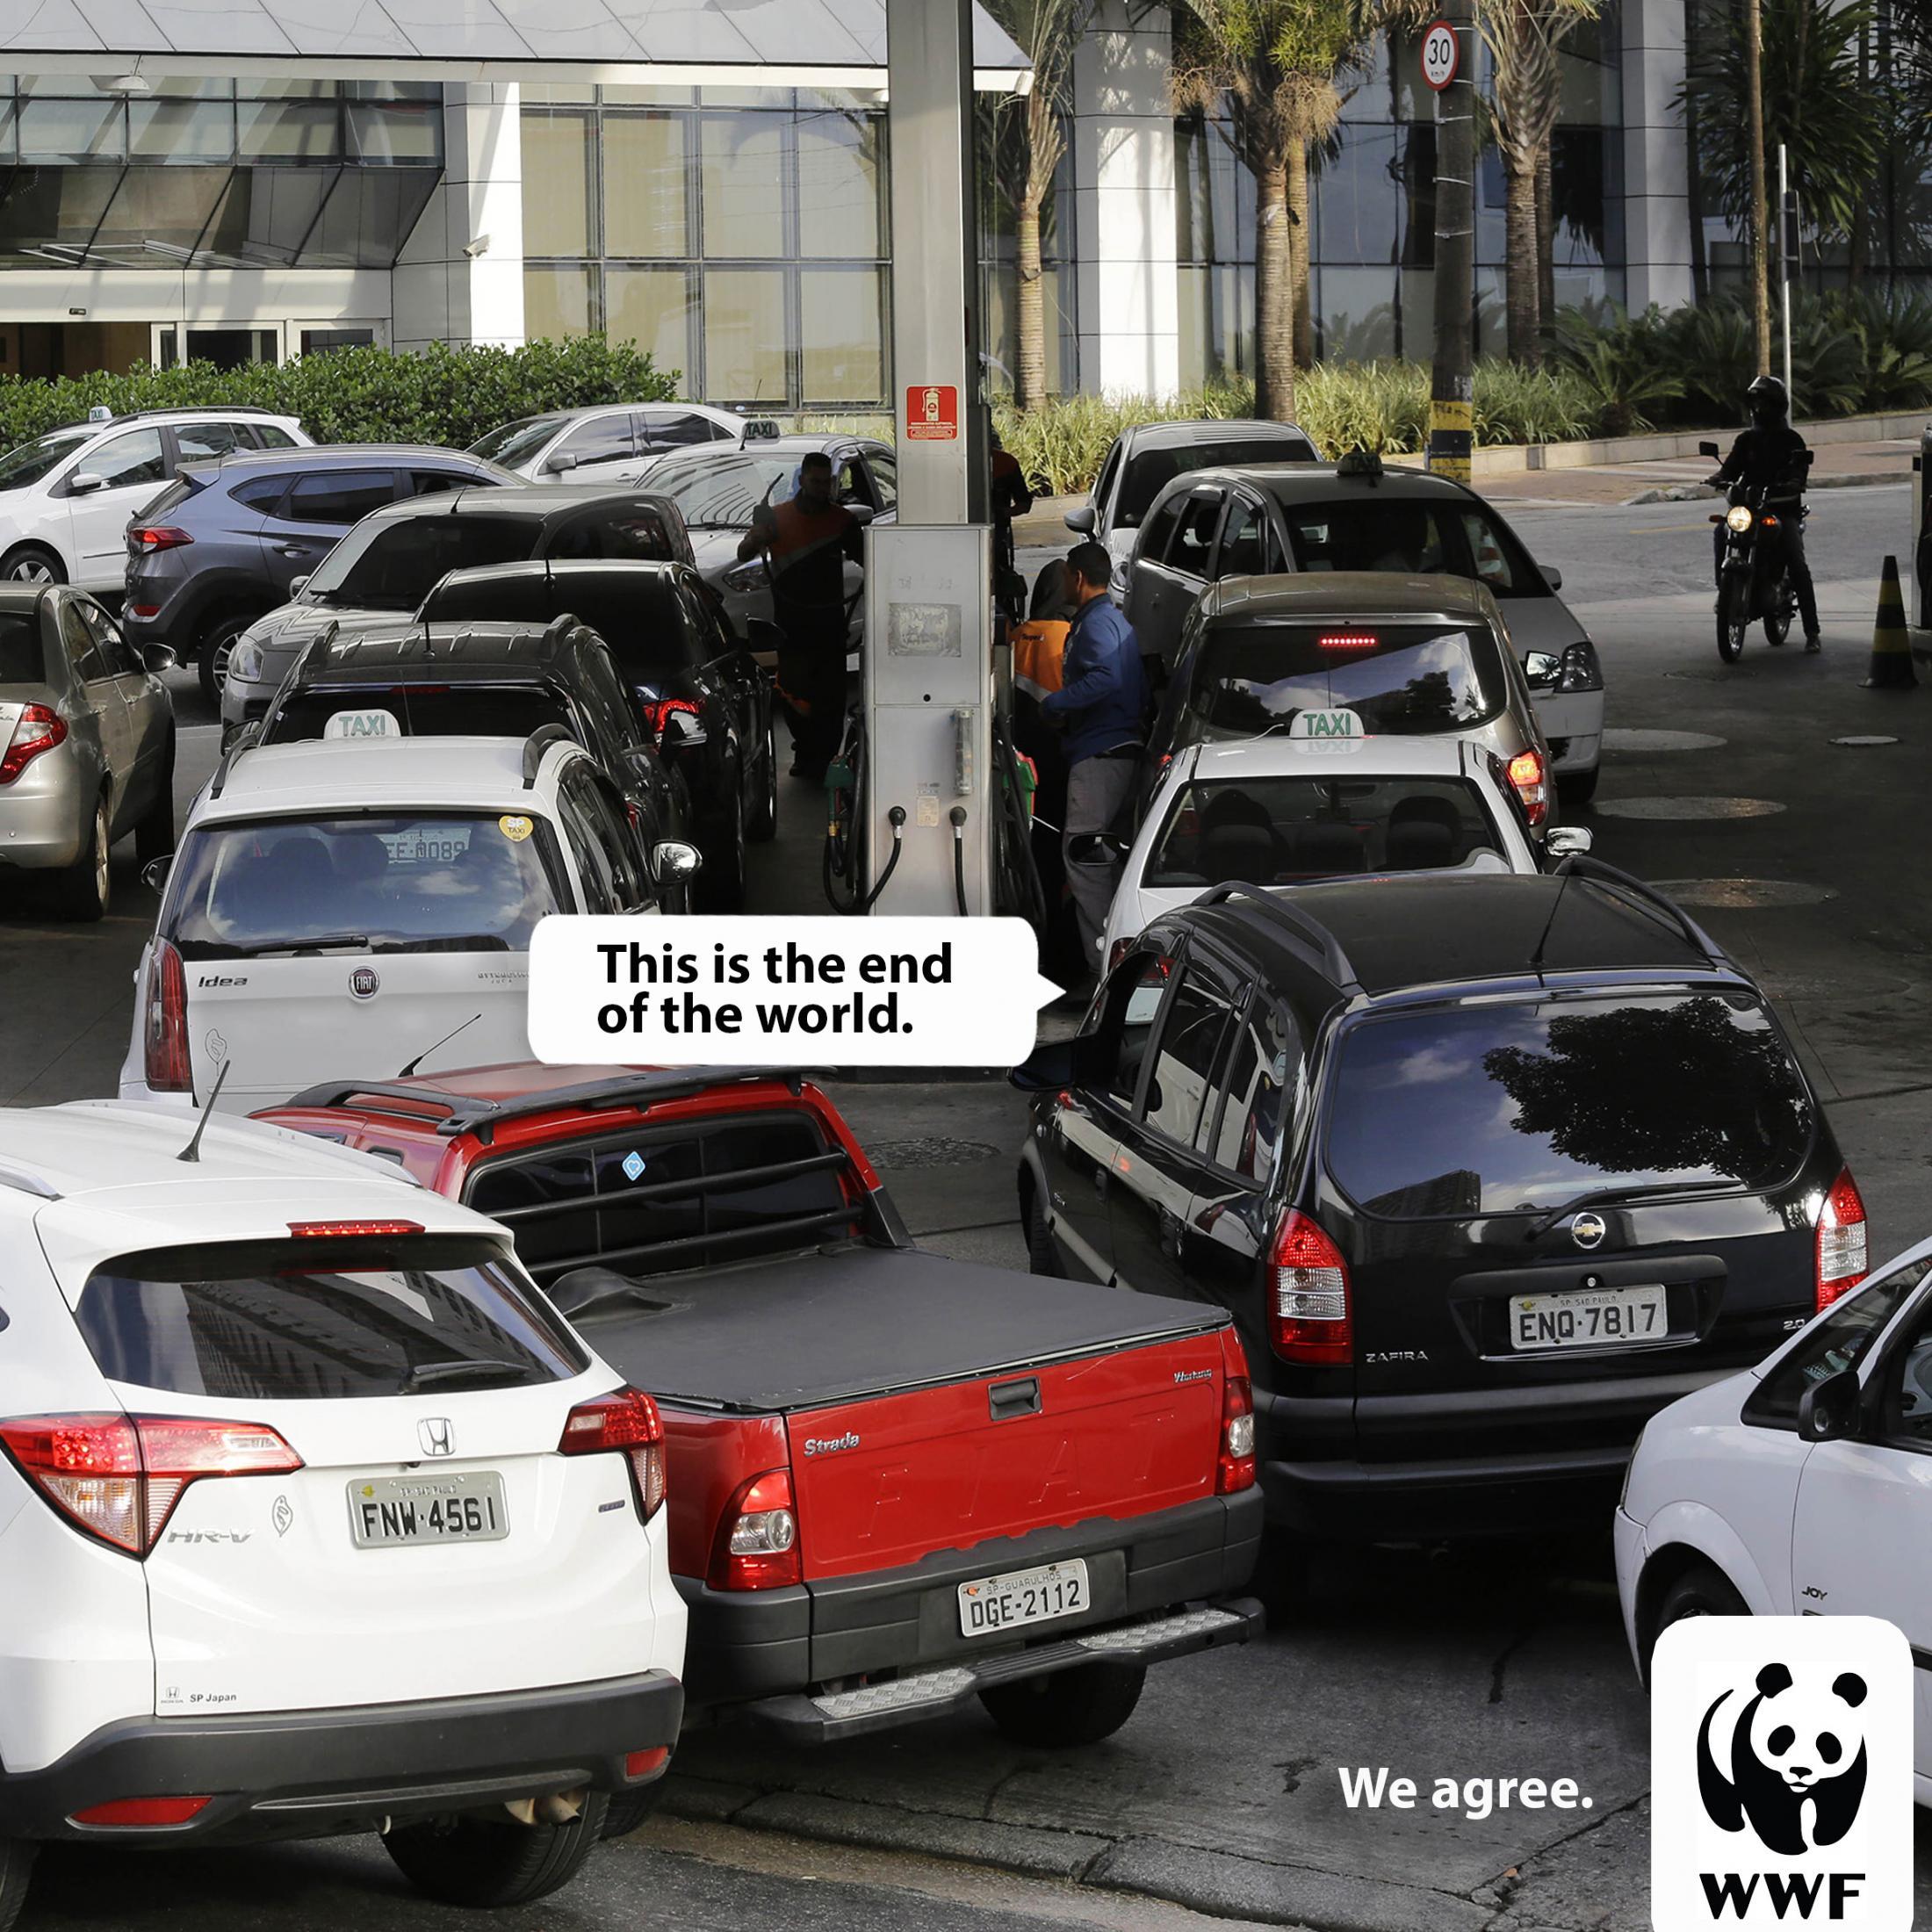 WWF Print Ad - We Agree